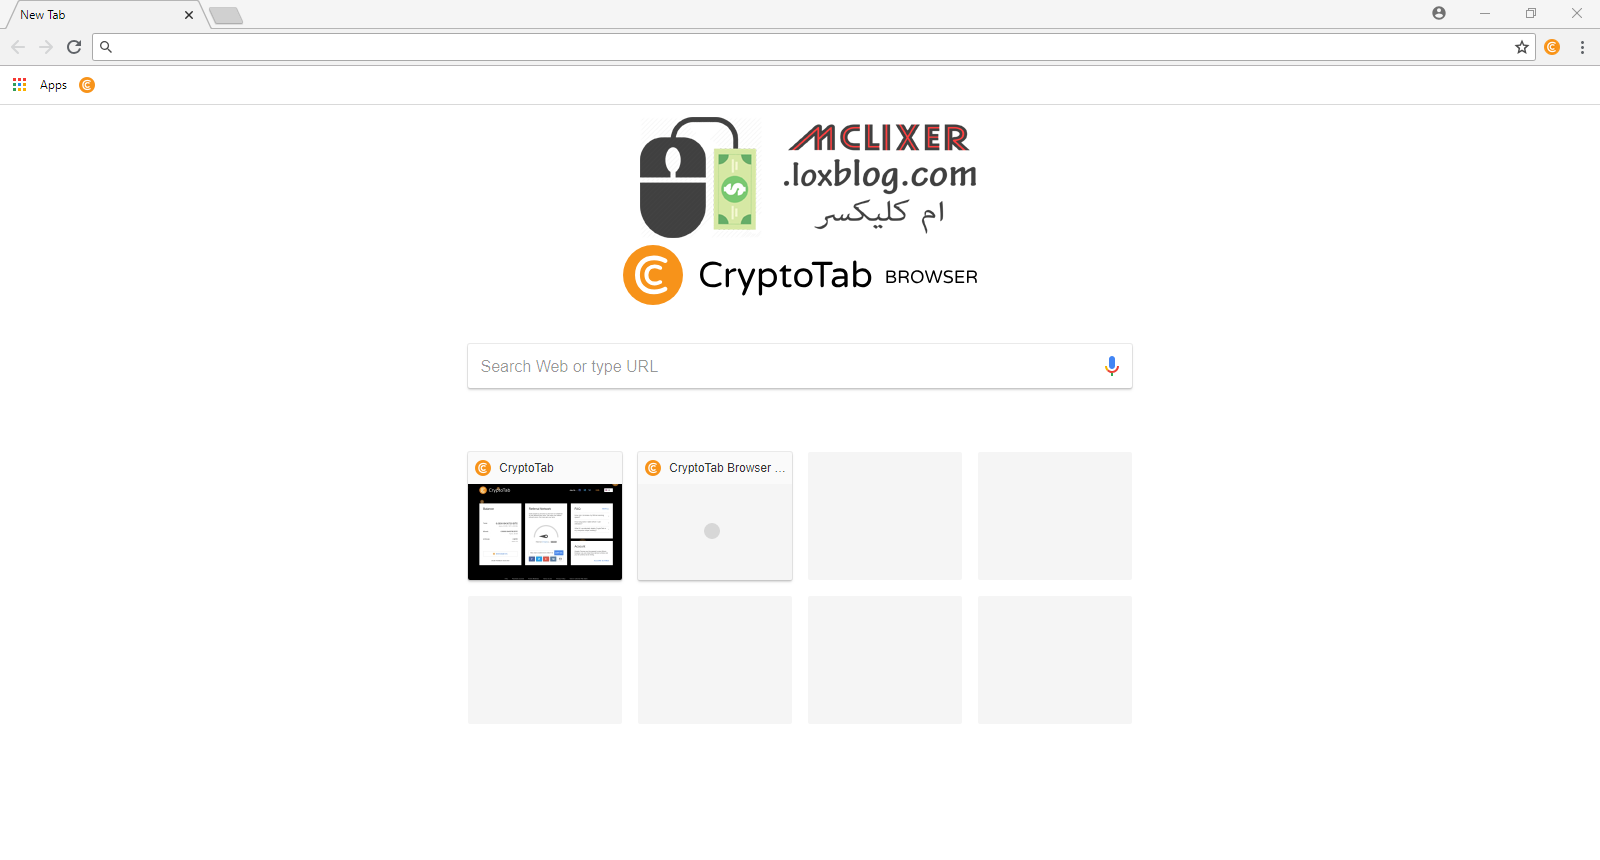 چگونگی کسب بیت کویین در Cryptotab